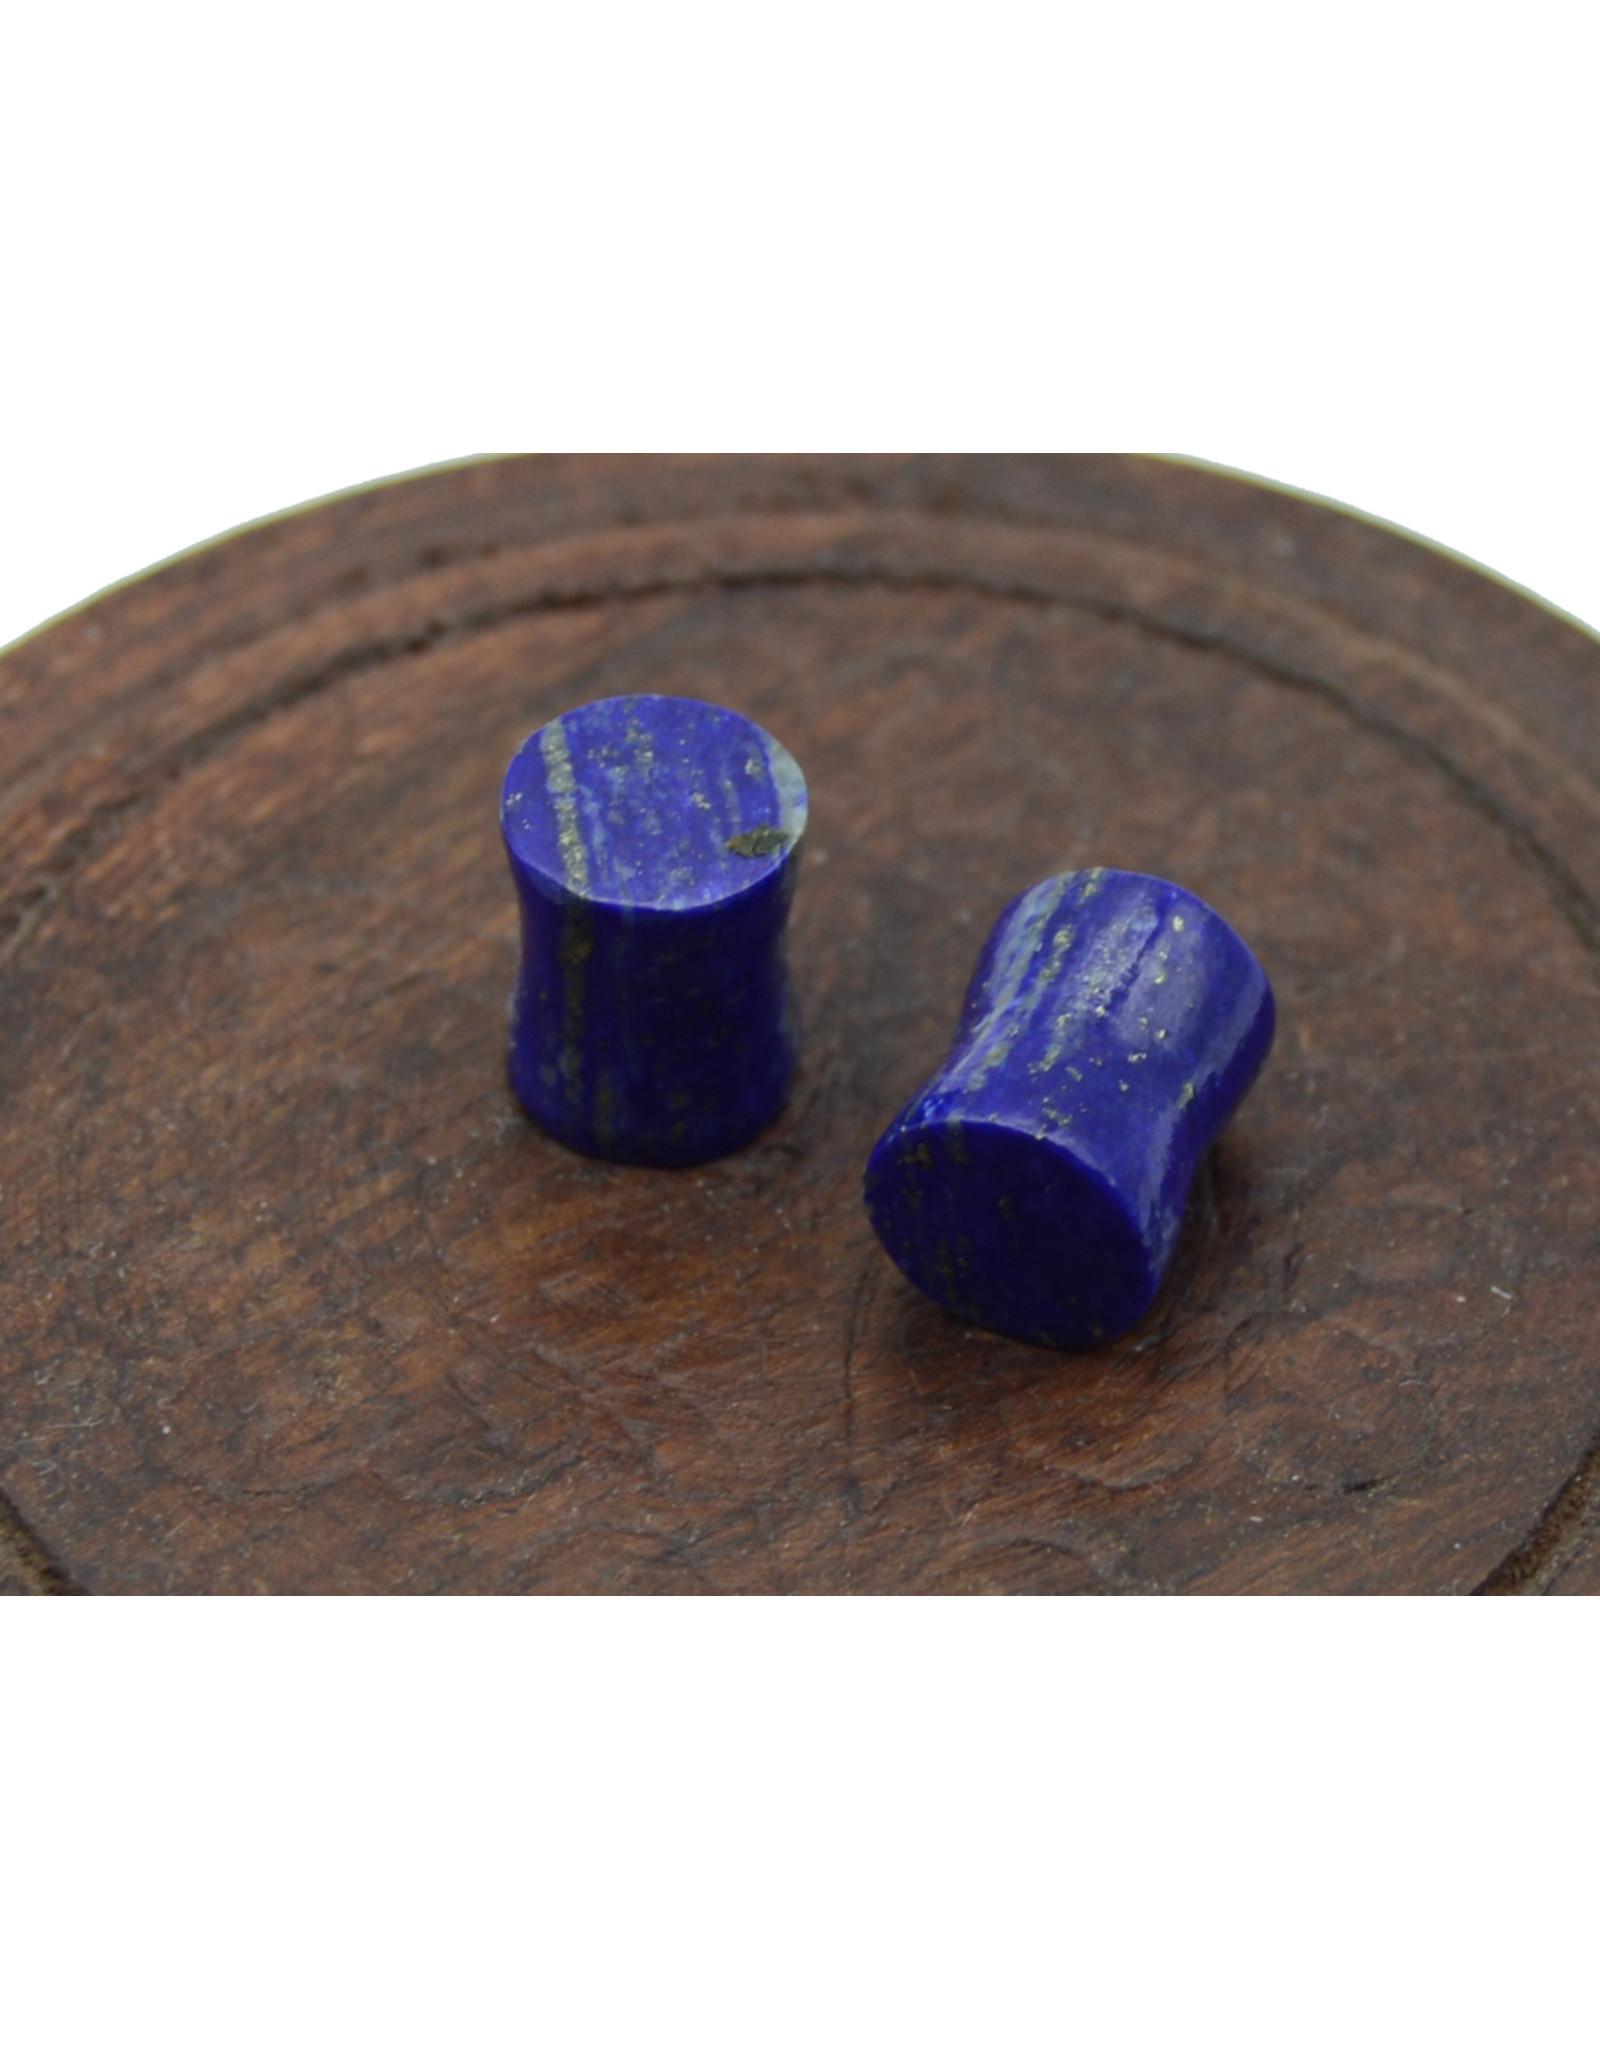 Lapis Lazuli Ear Plugs